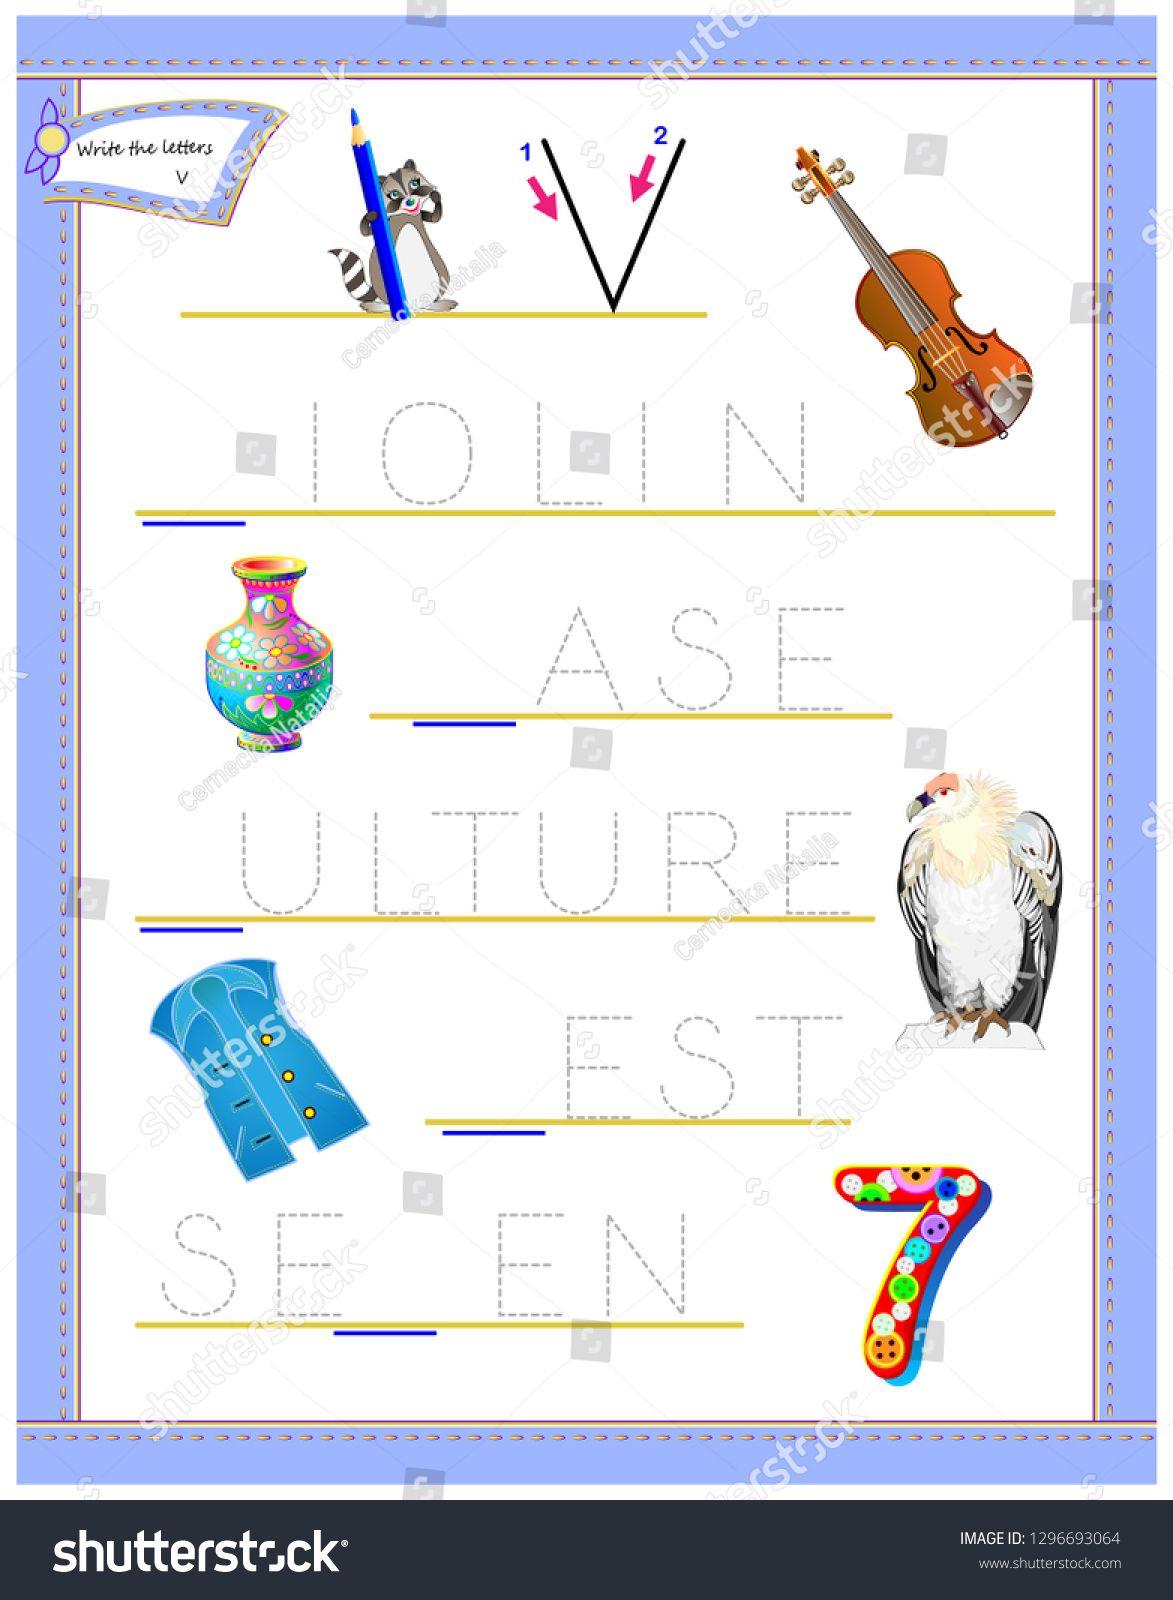 Tracing Letter V For Study English Alphabet Printable